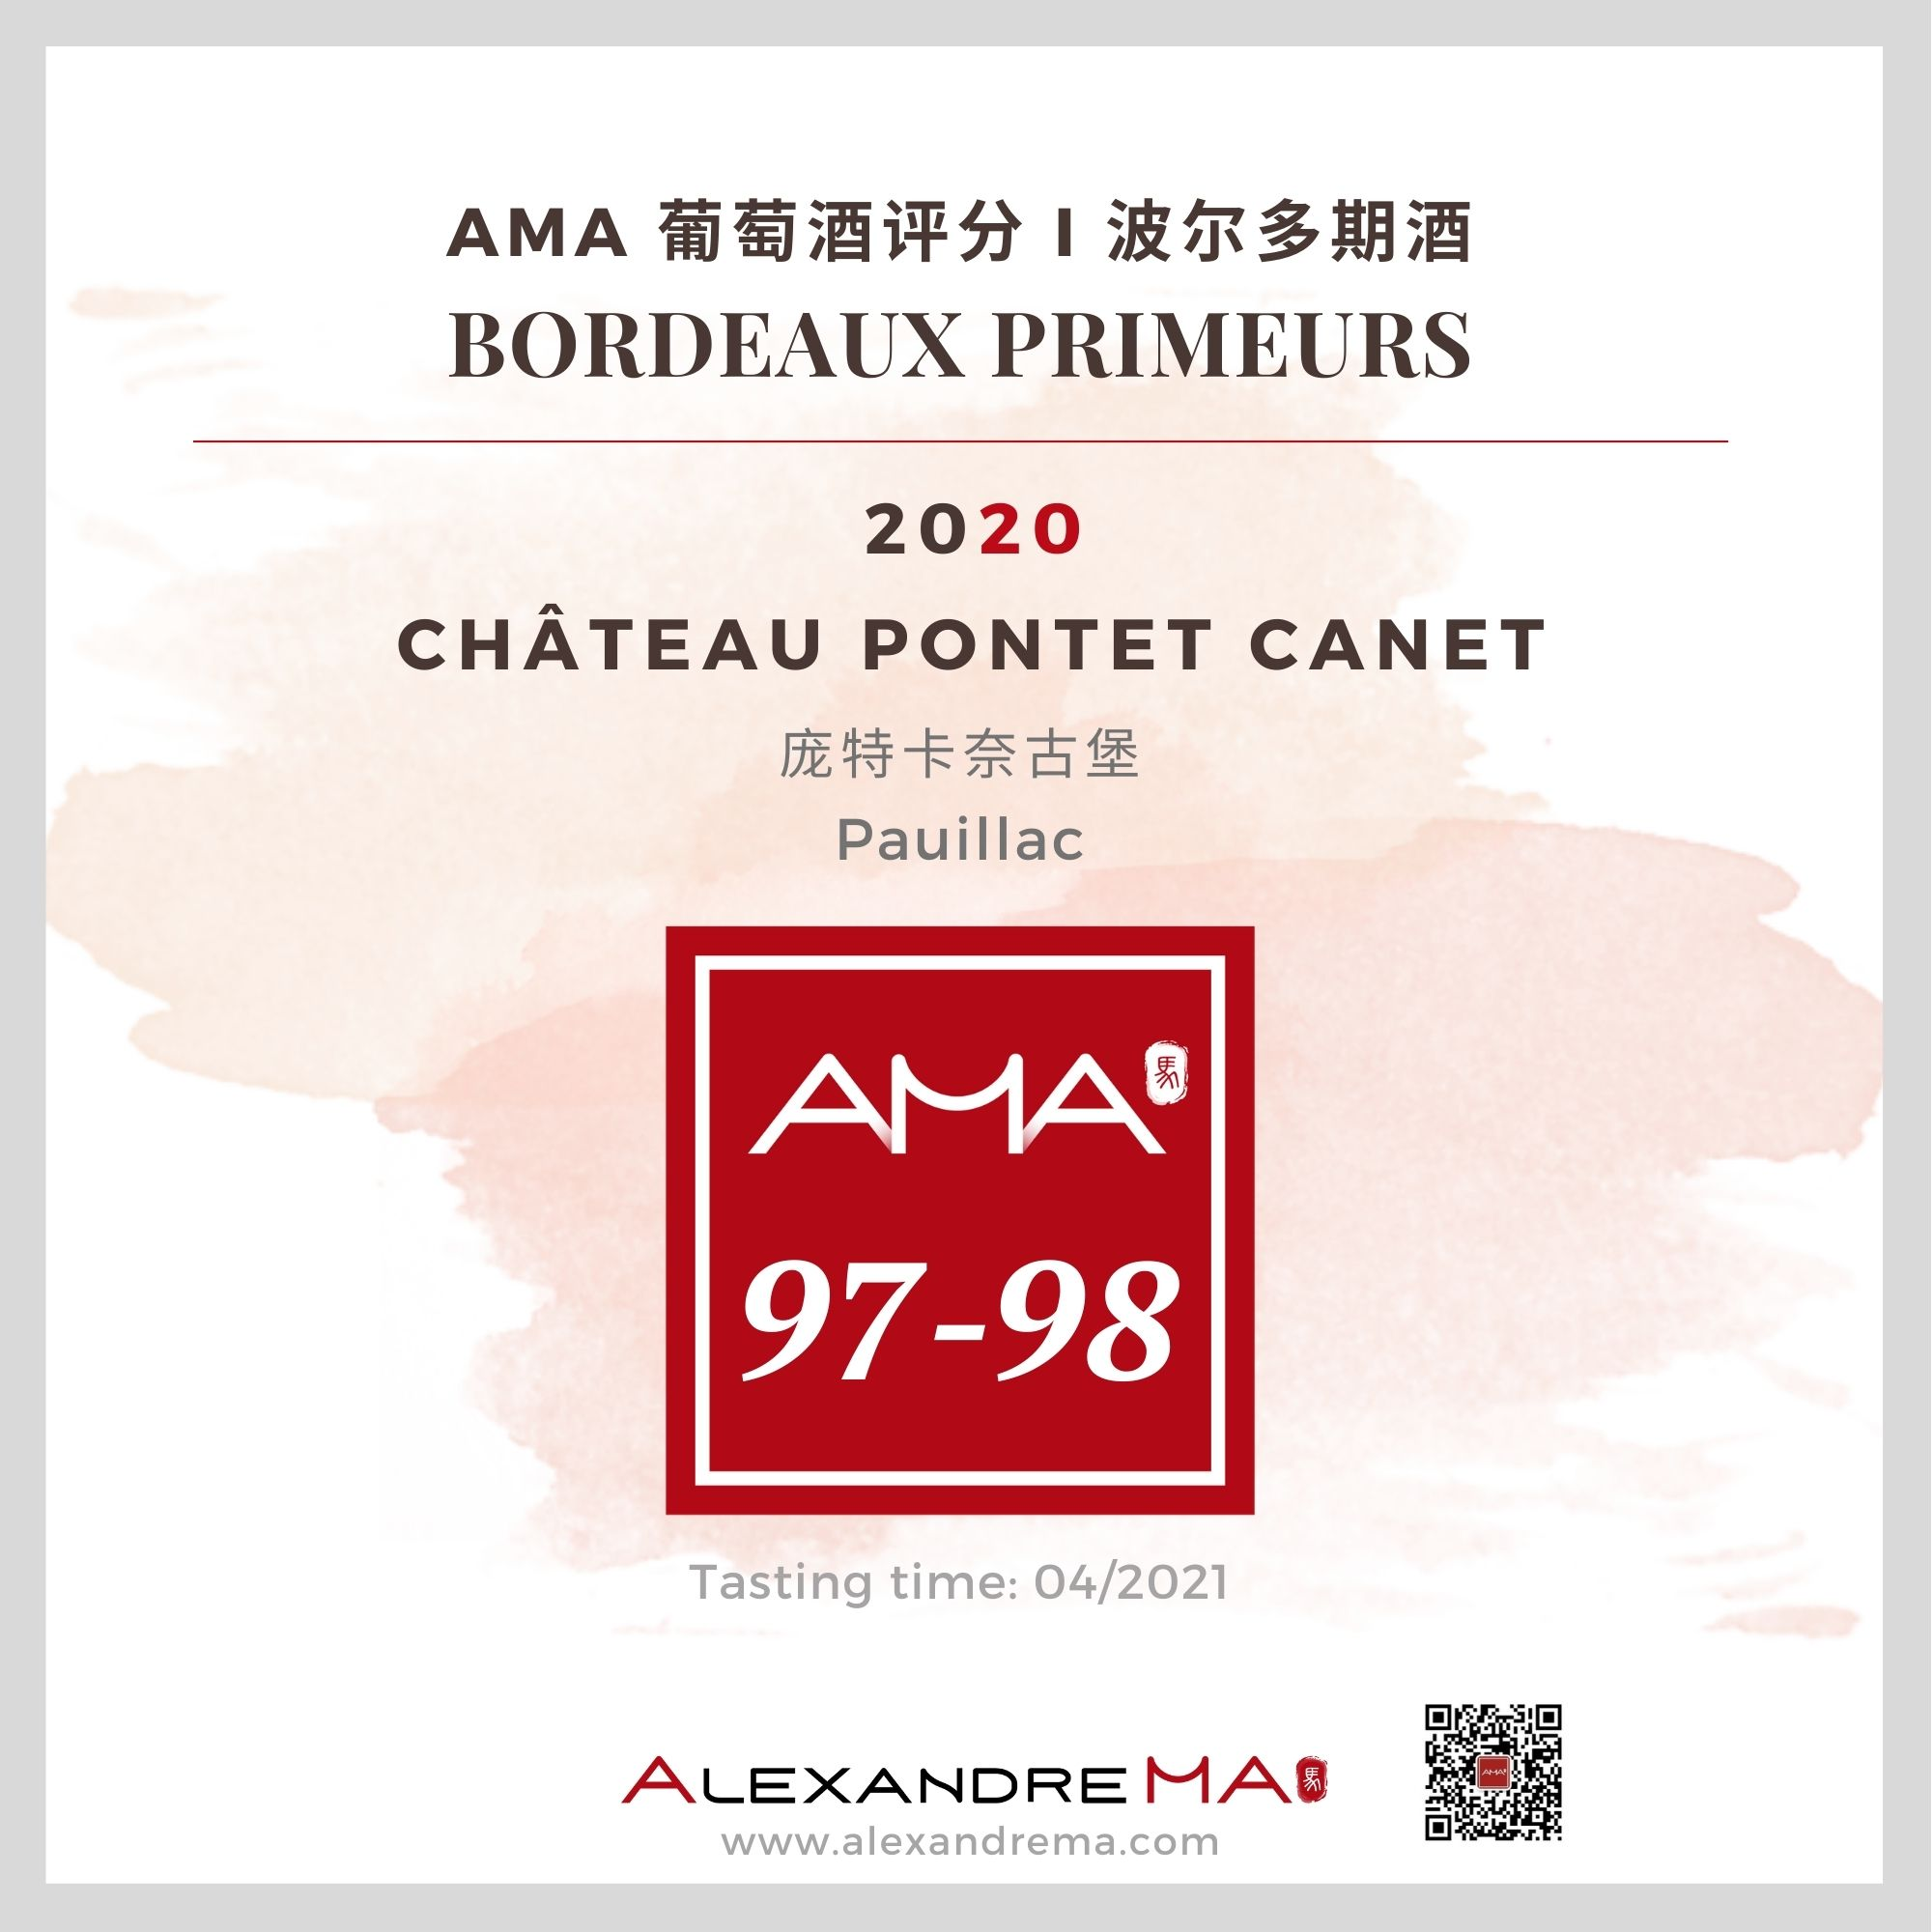 Château Pontet-Canet 2020 - Alexandre MA